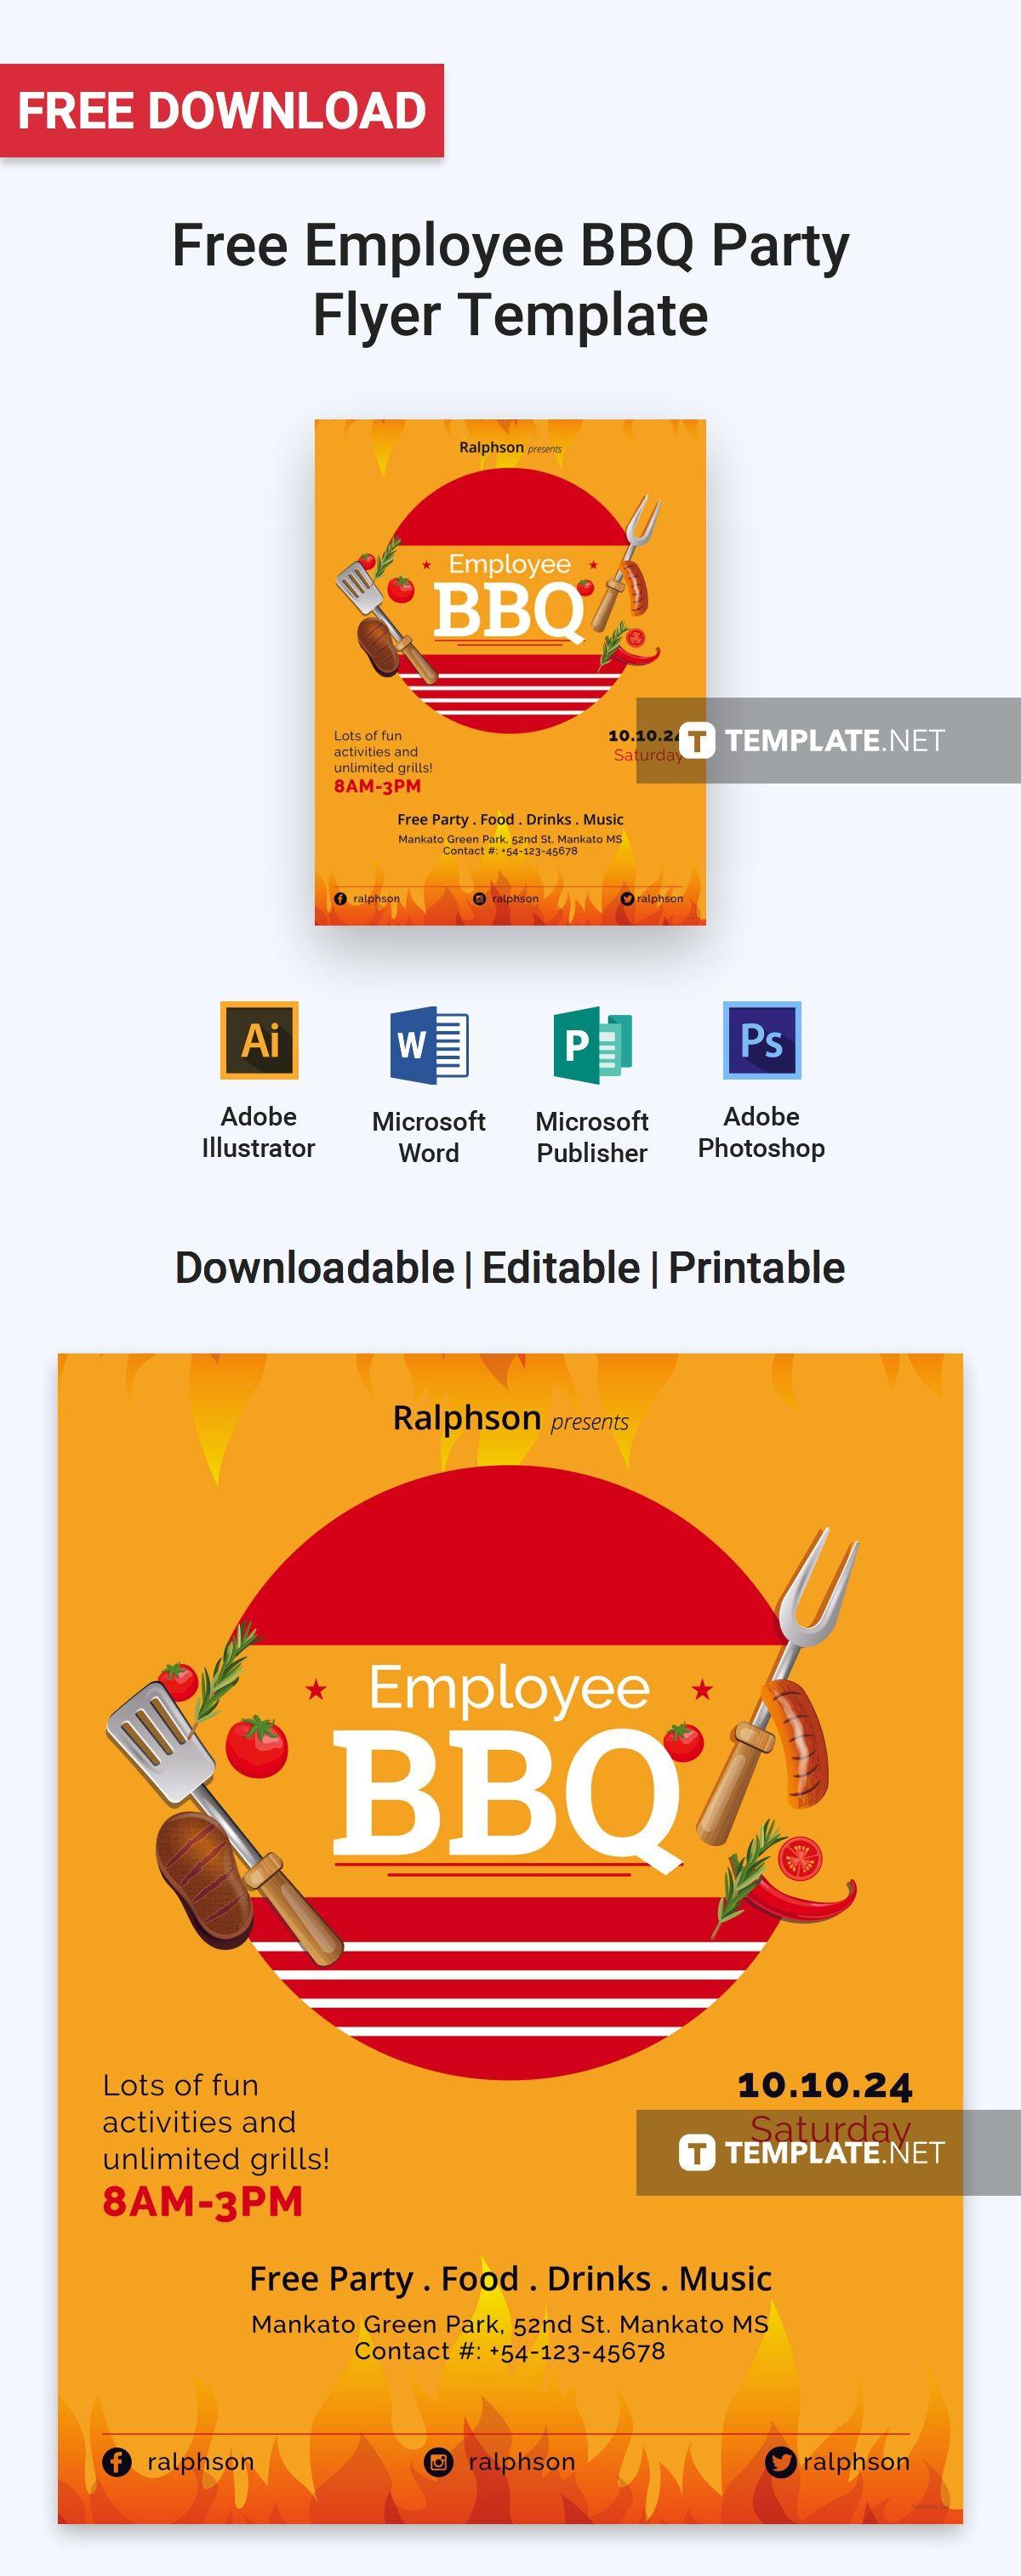 free employee bbq party flyer free flyer templates pinterest